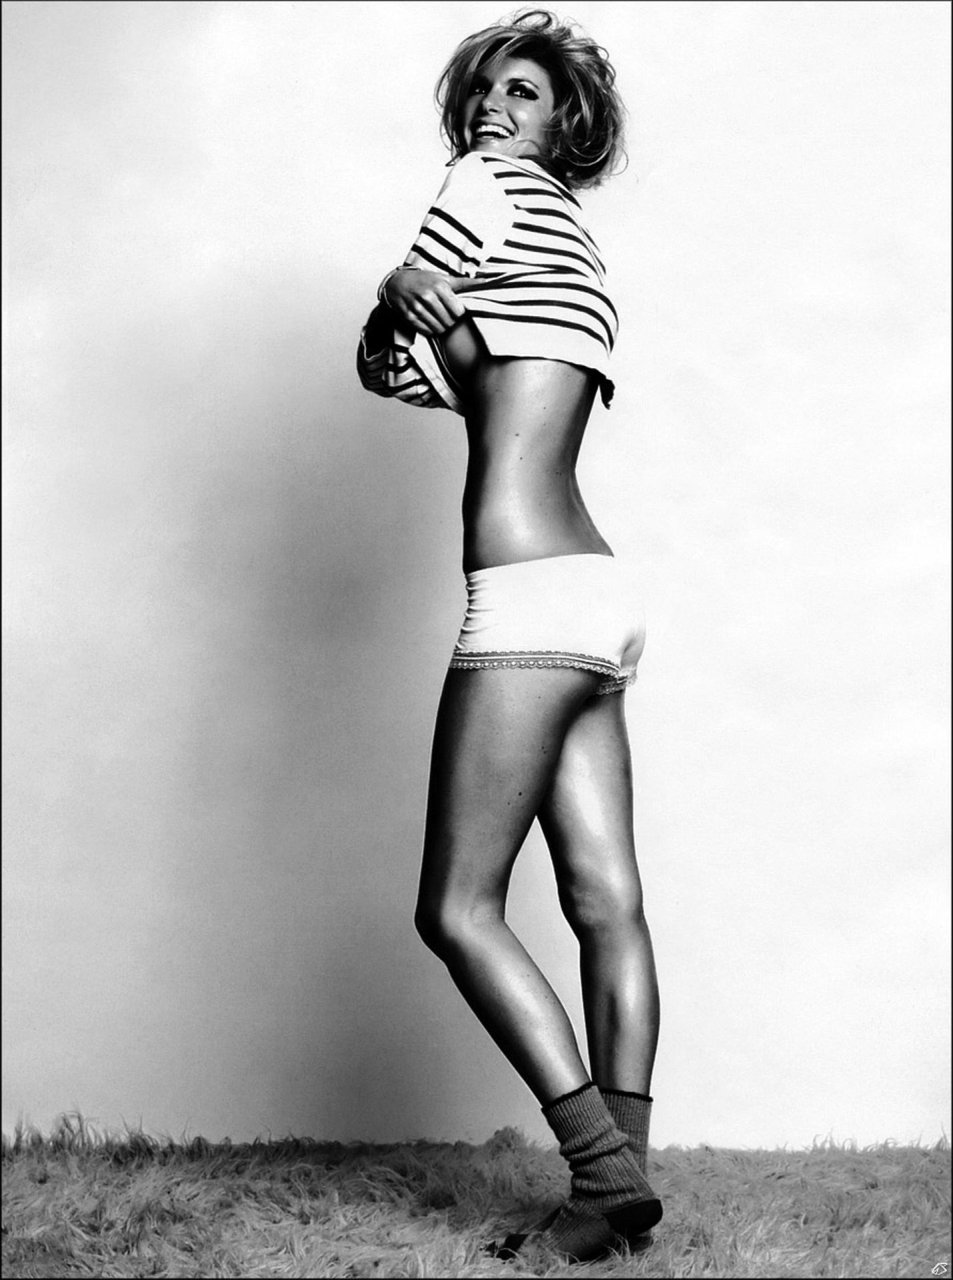 Marisa-Miller-Nude-TheFappeningBlog.com-36.jpg